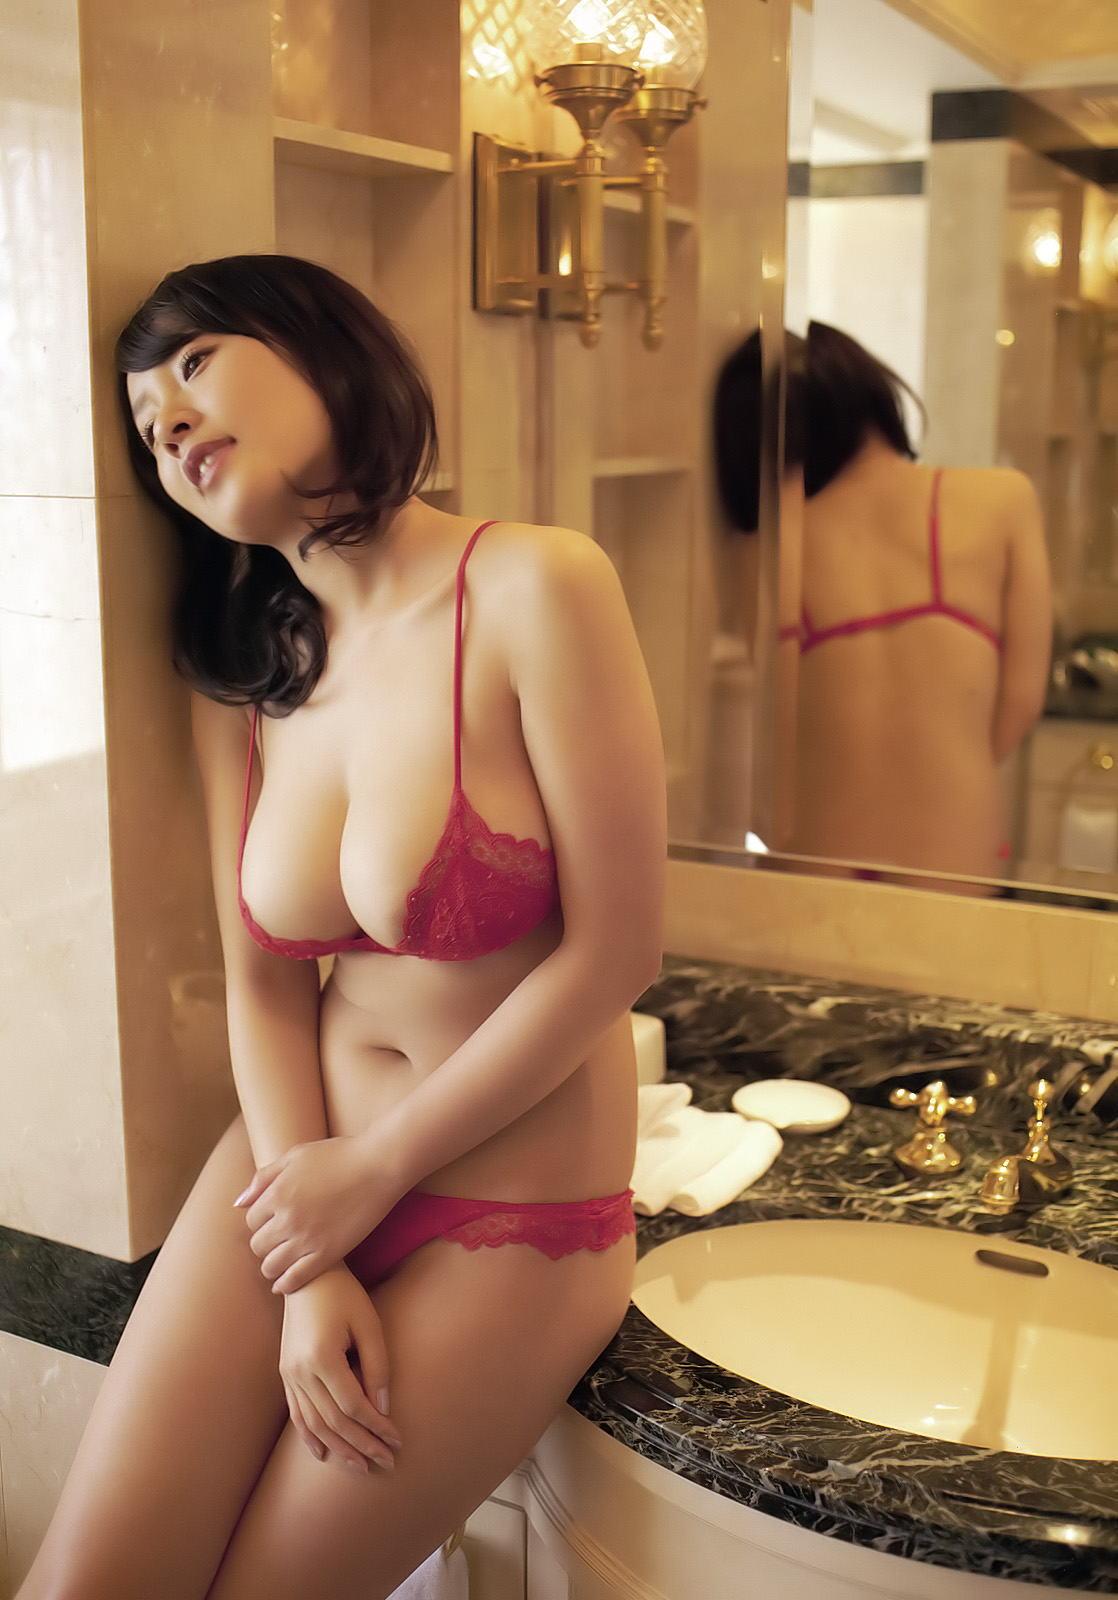 image http://scanlover.com/assets/images/3774-8QqKRay6soAbWtHw.jpeg